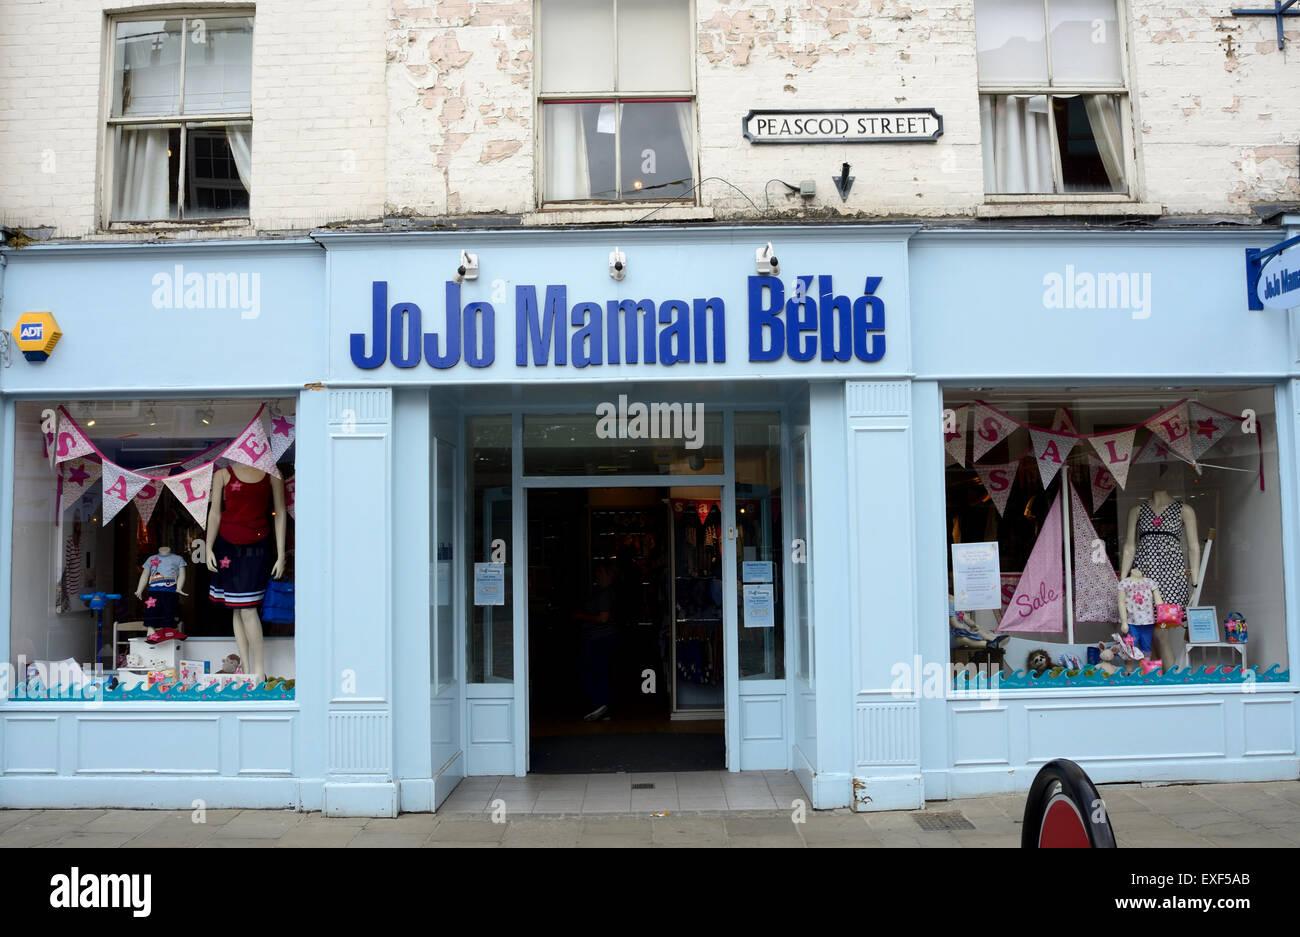 ceb55490d El JoJo Maman Bebe store en la calle Peascod en Windsor. Imagen De Stock